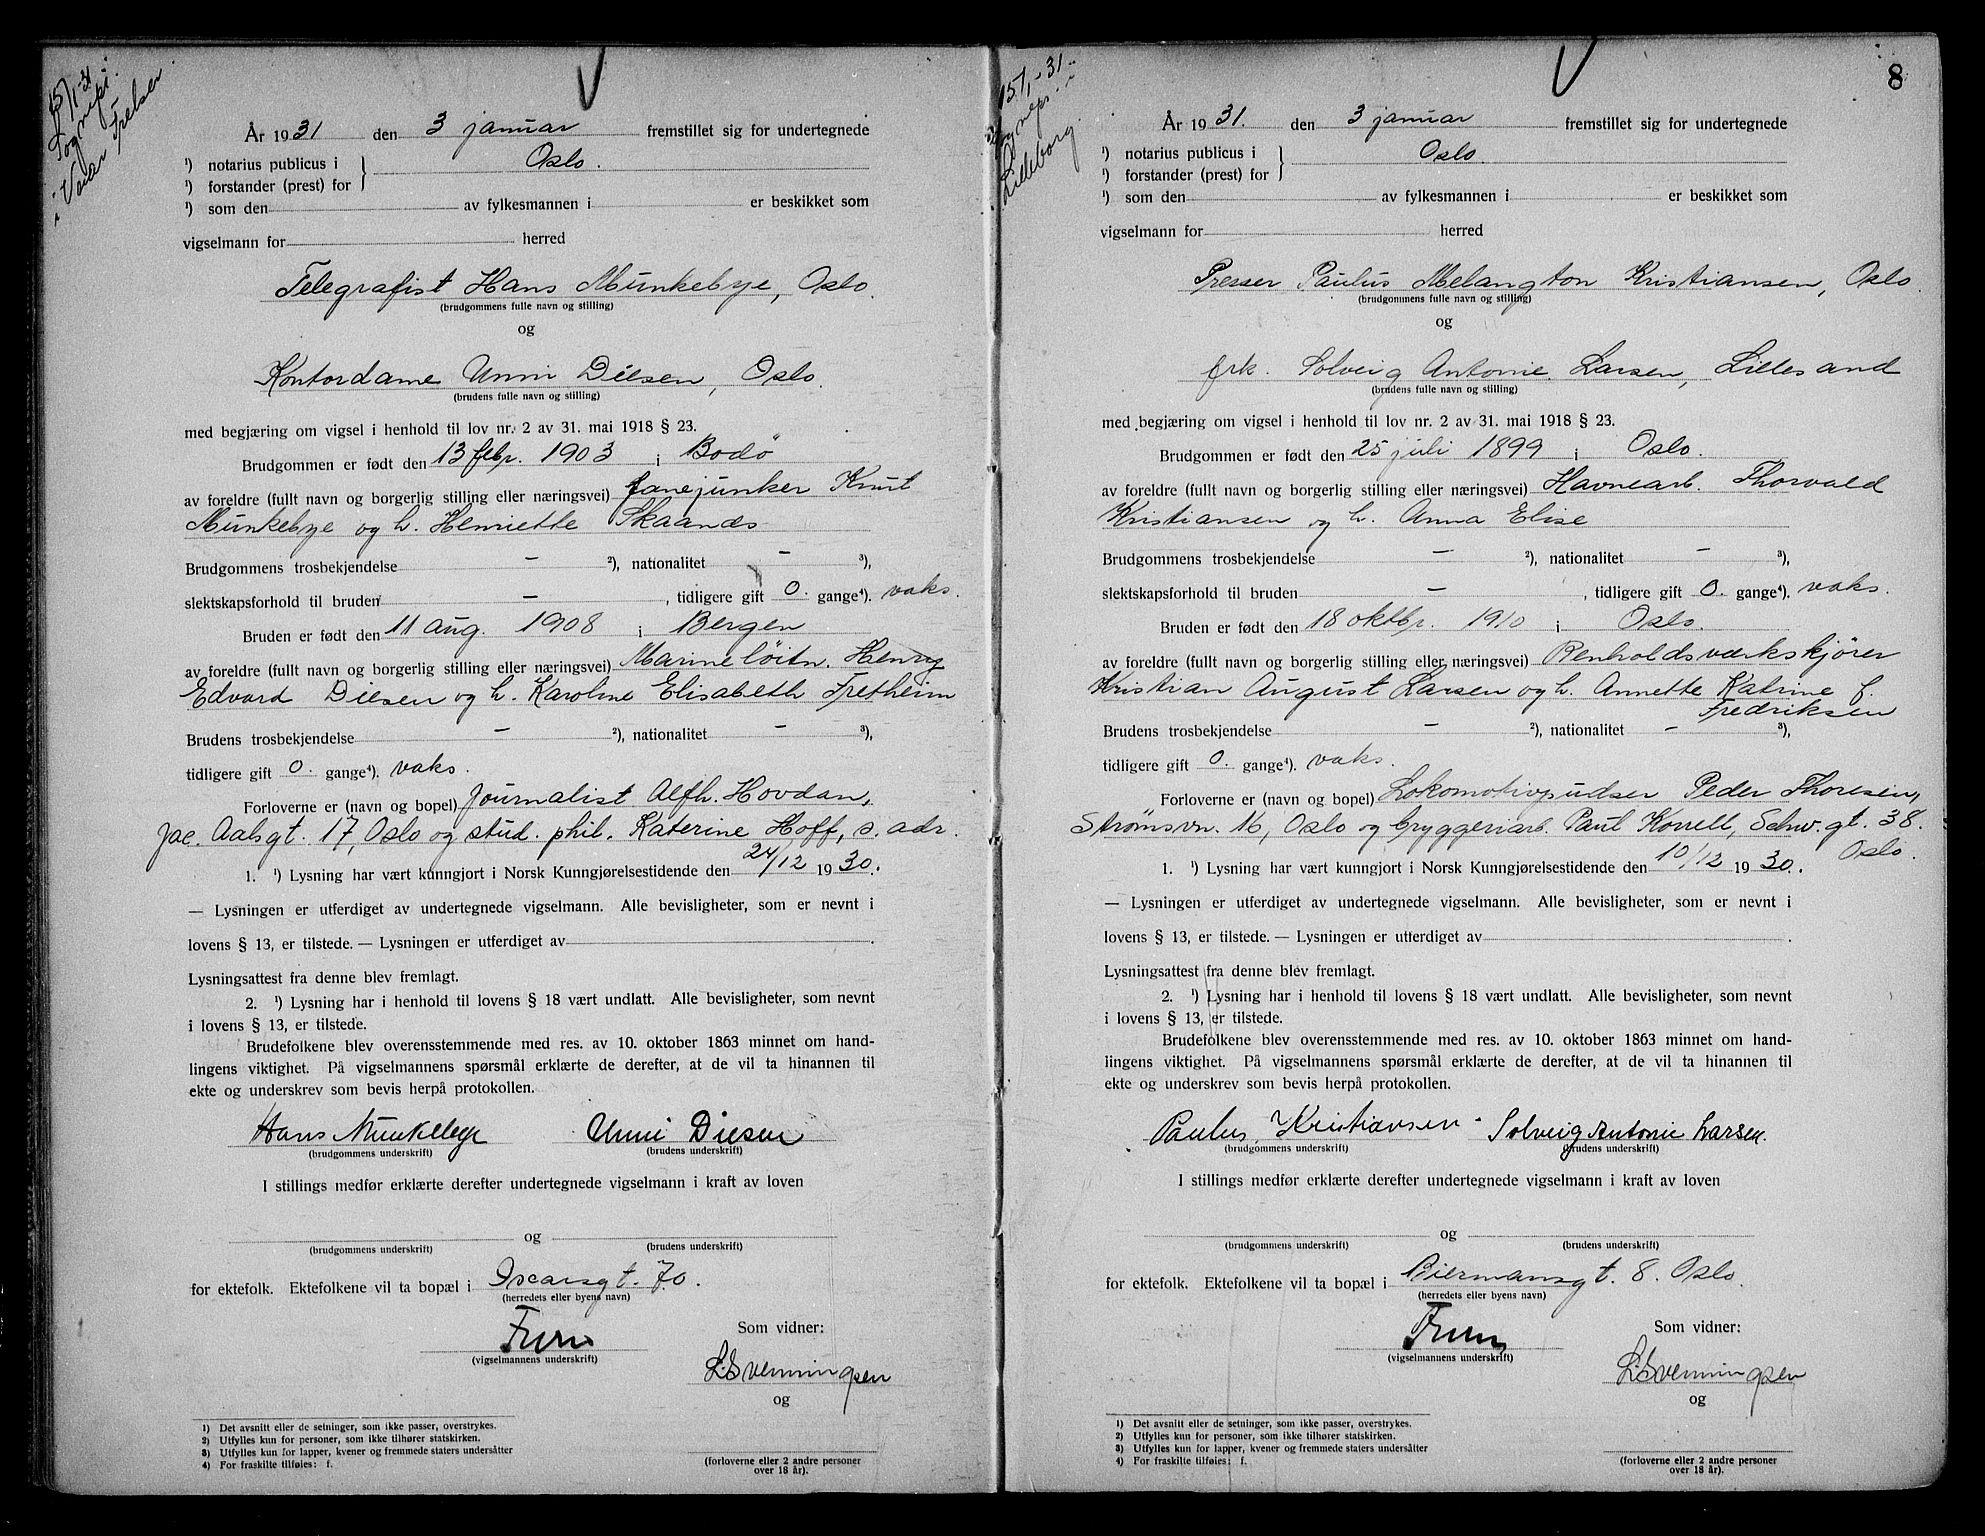 SAO, Oslo byfogd avd. I, L/Lb/Lbb/L0021: Notarialprotokoll, rekke II: Vigsler, 1930-1932, s. 7b-8a